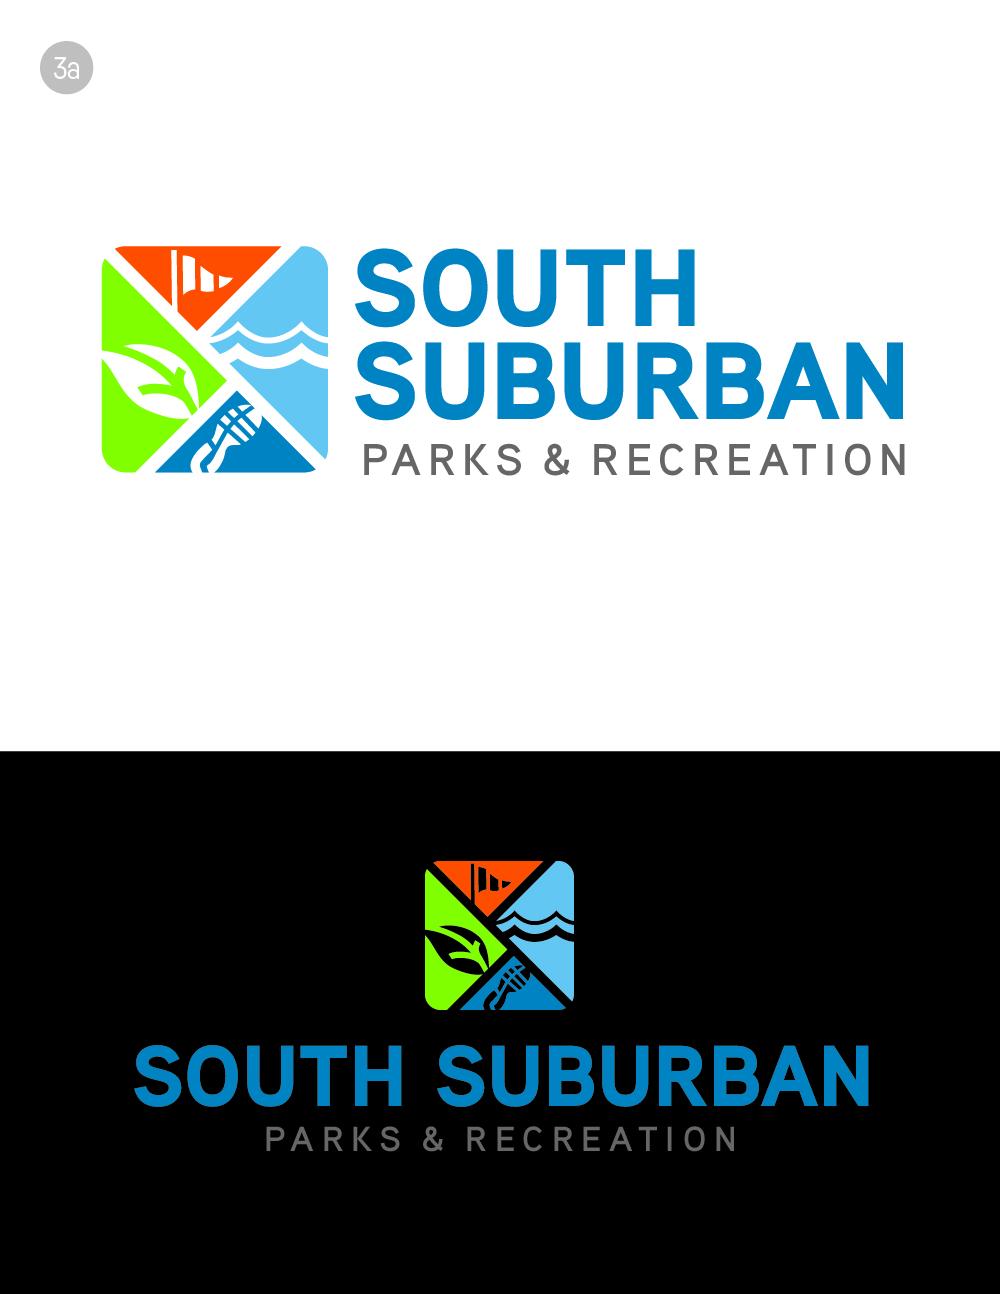 2018-05-03 SS logo 3a.jpg